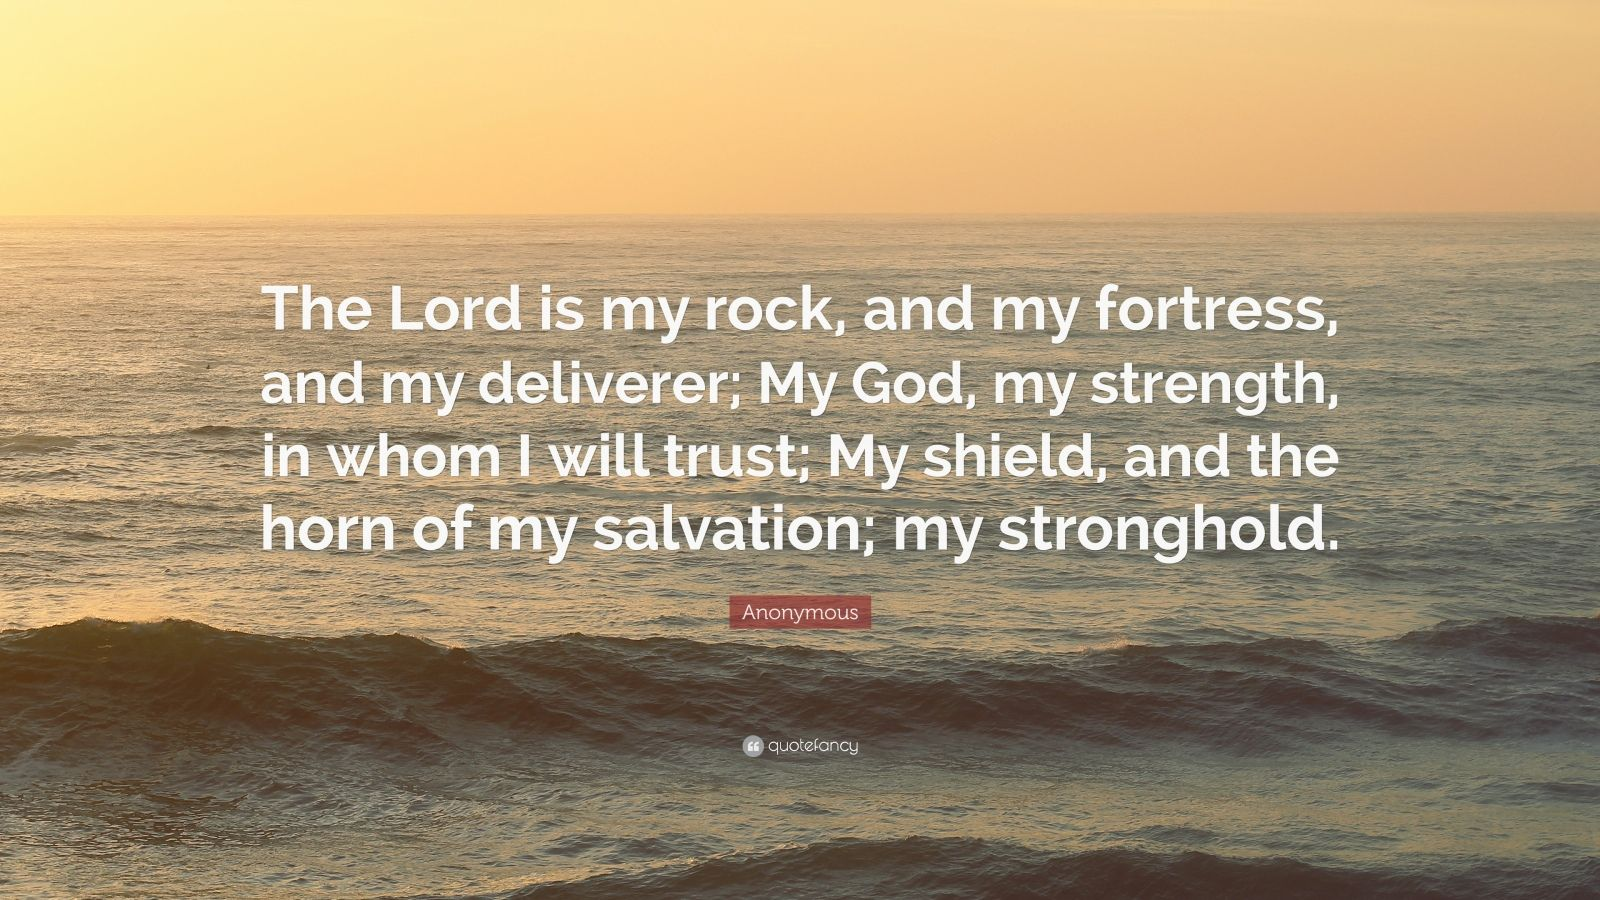 Psalm 23:1-6 AMPC